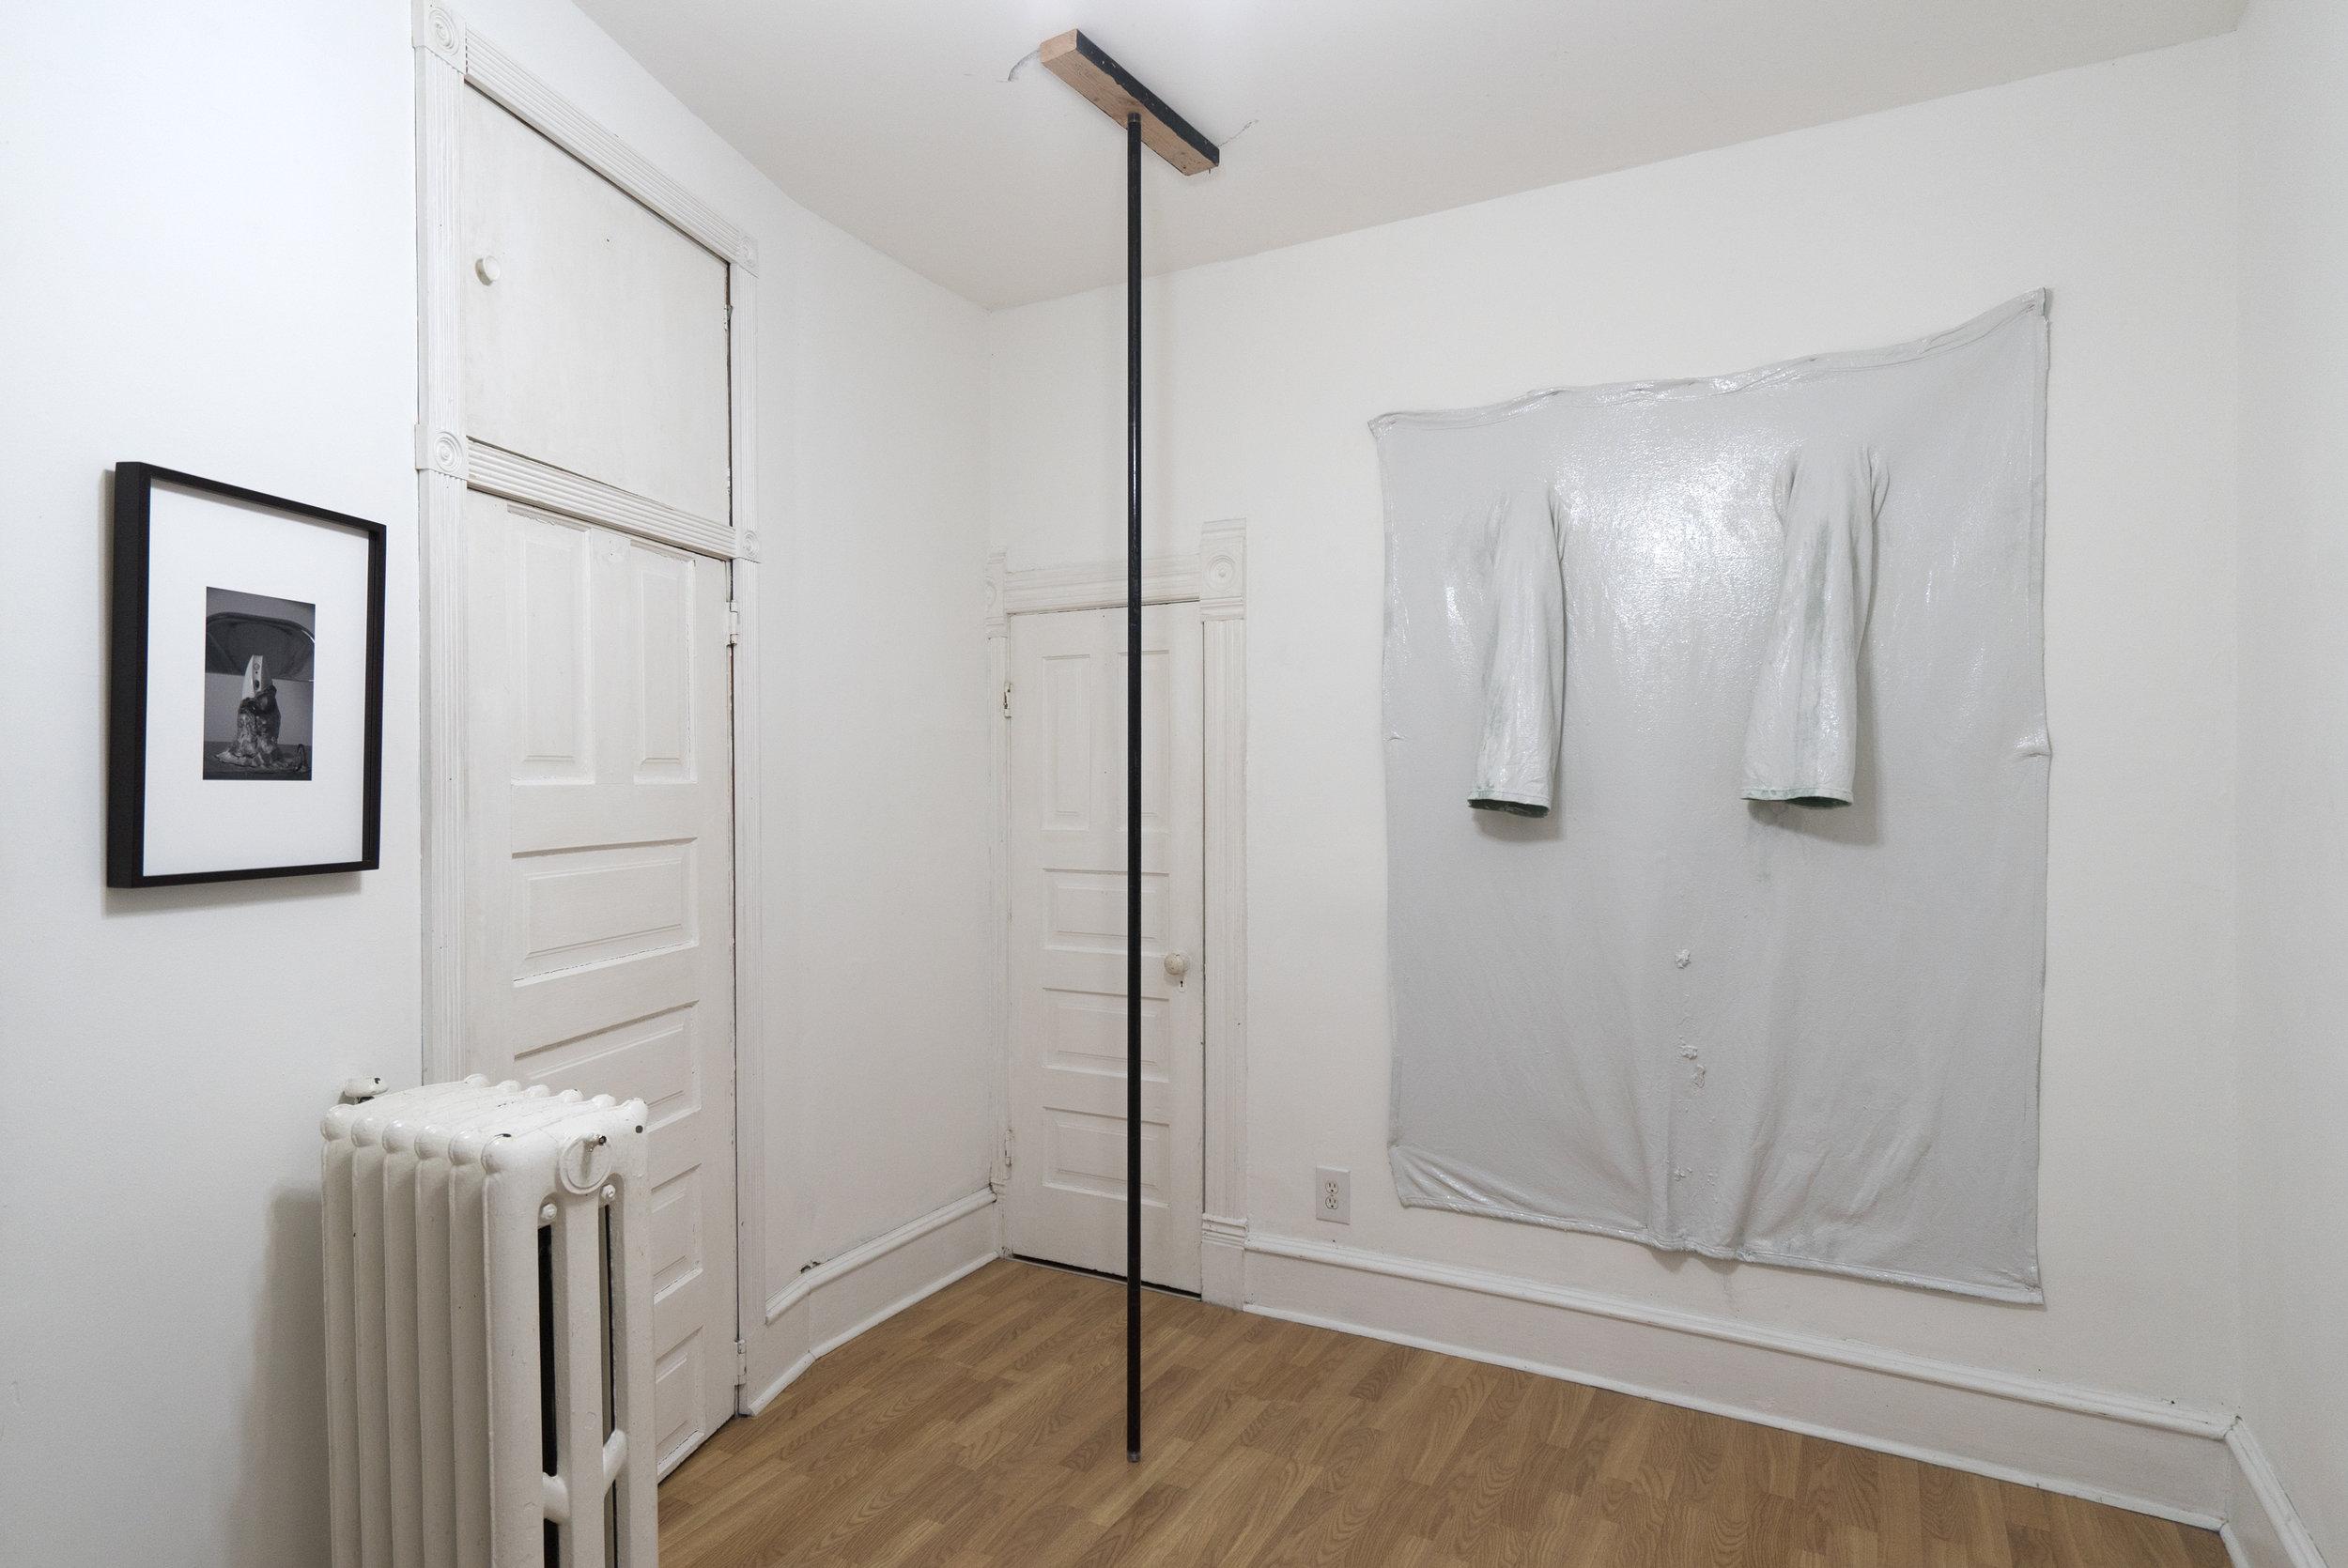 joe smith  / installation view